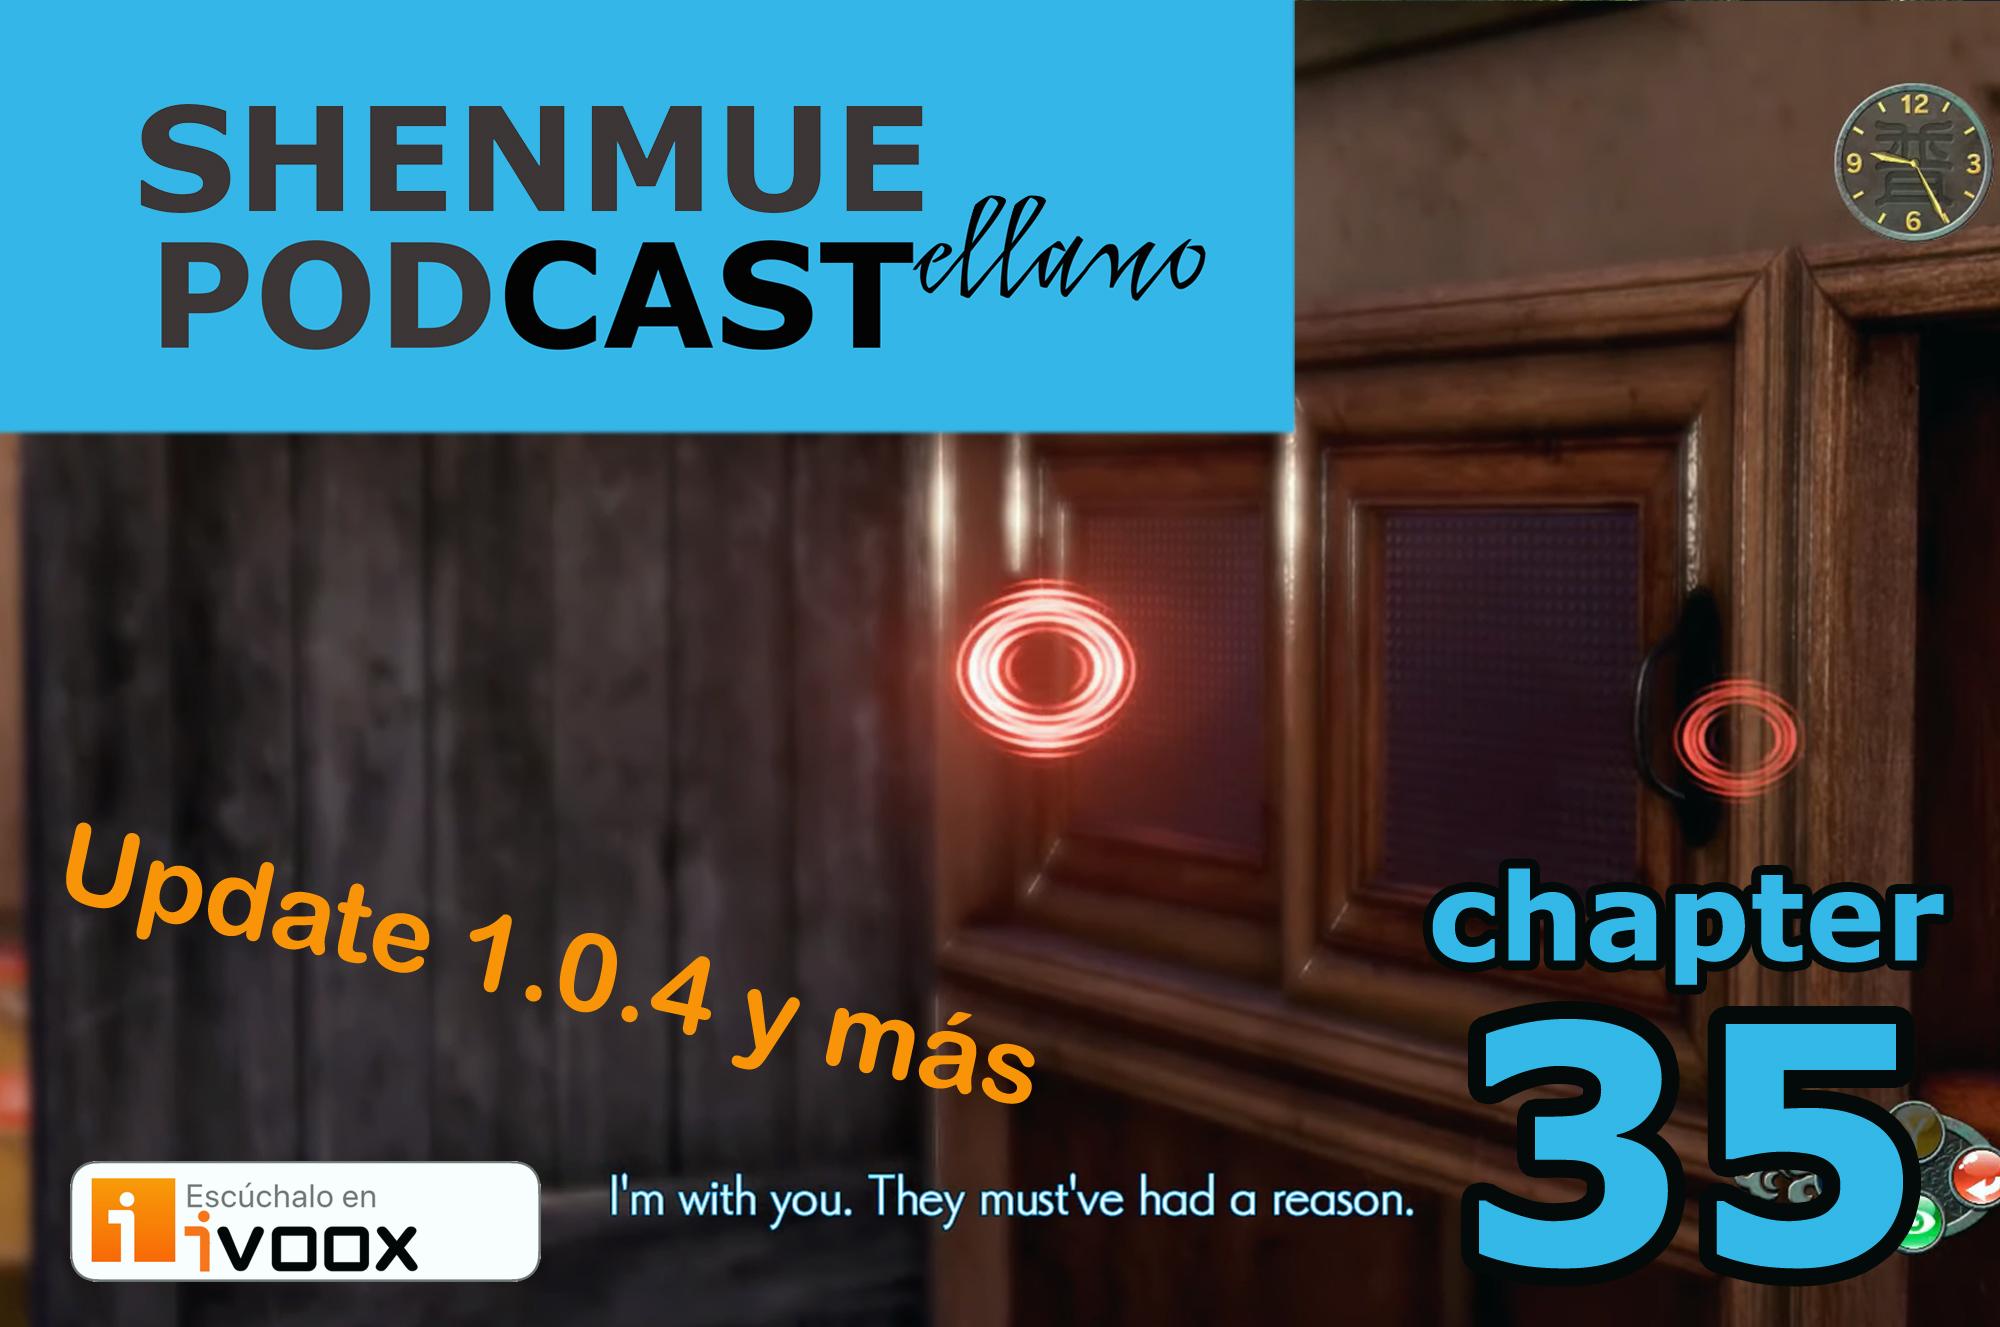 shenmue podcast en español update shenmue 3 1.0.4 alfonso martinez javi ryu fujiwara